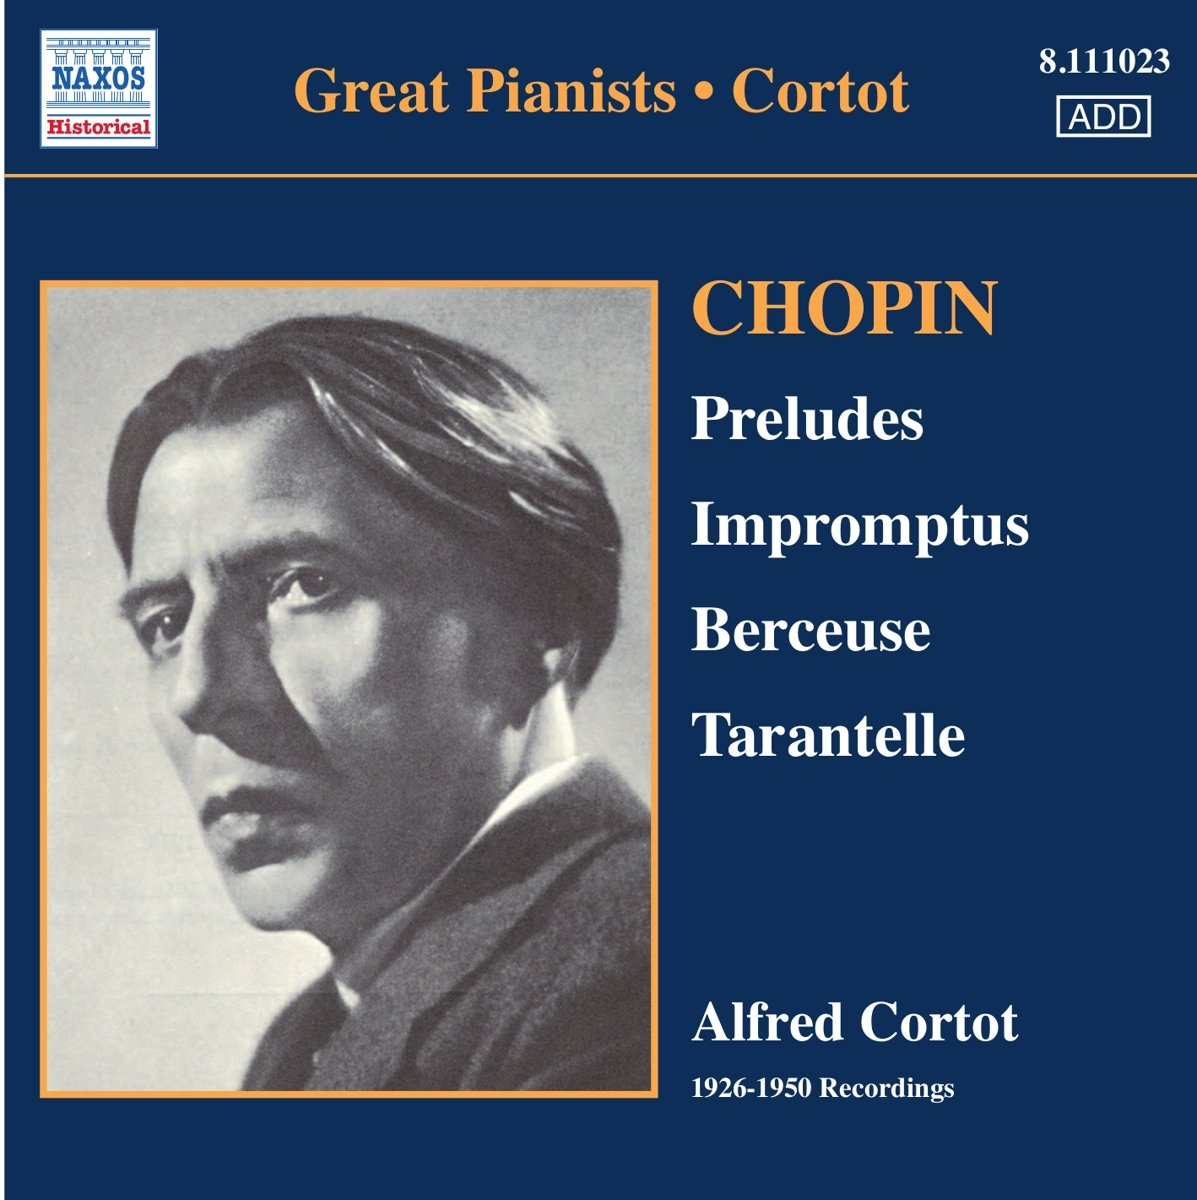 Chopin: Preludes, Impromptus, Berceuse, Tarantelle